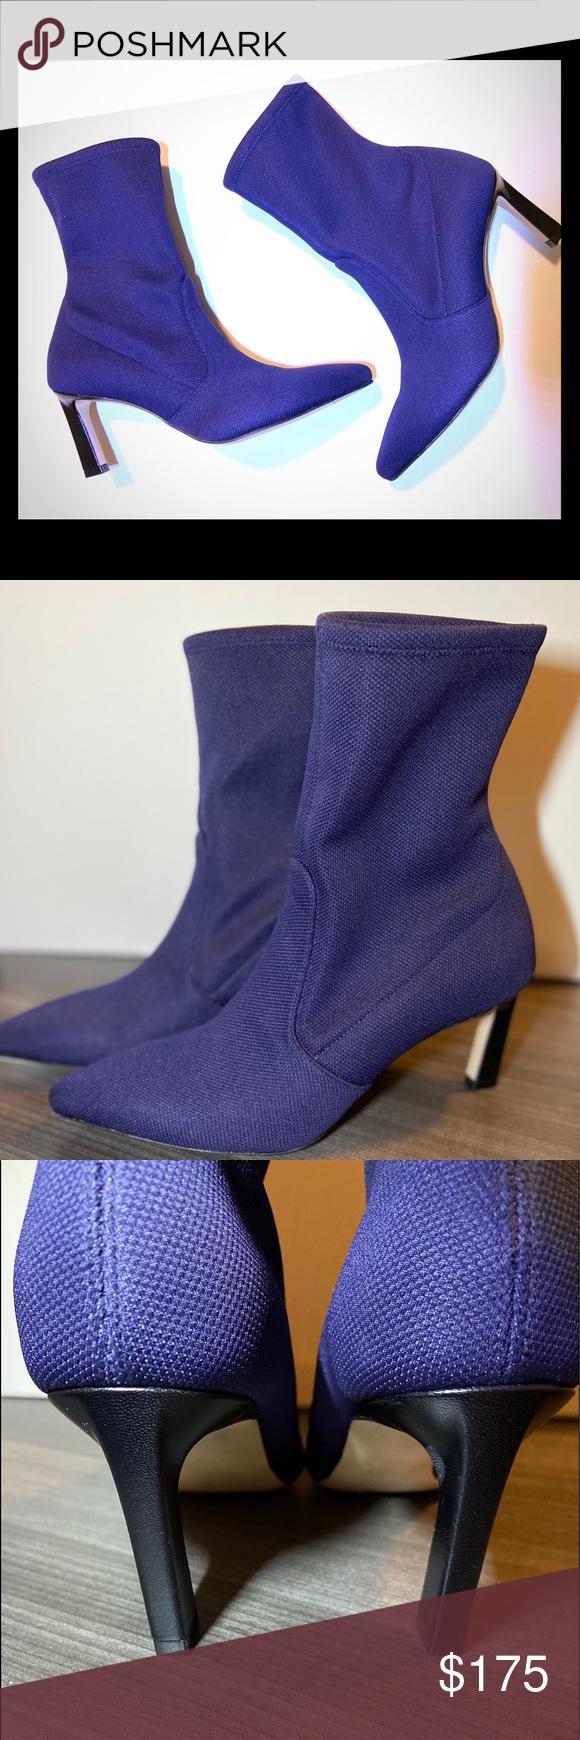 STUART WEITZMAN Blue ankle boots NWOT STUART WEITZMAN RAPTURE Blue Knit Stretch …